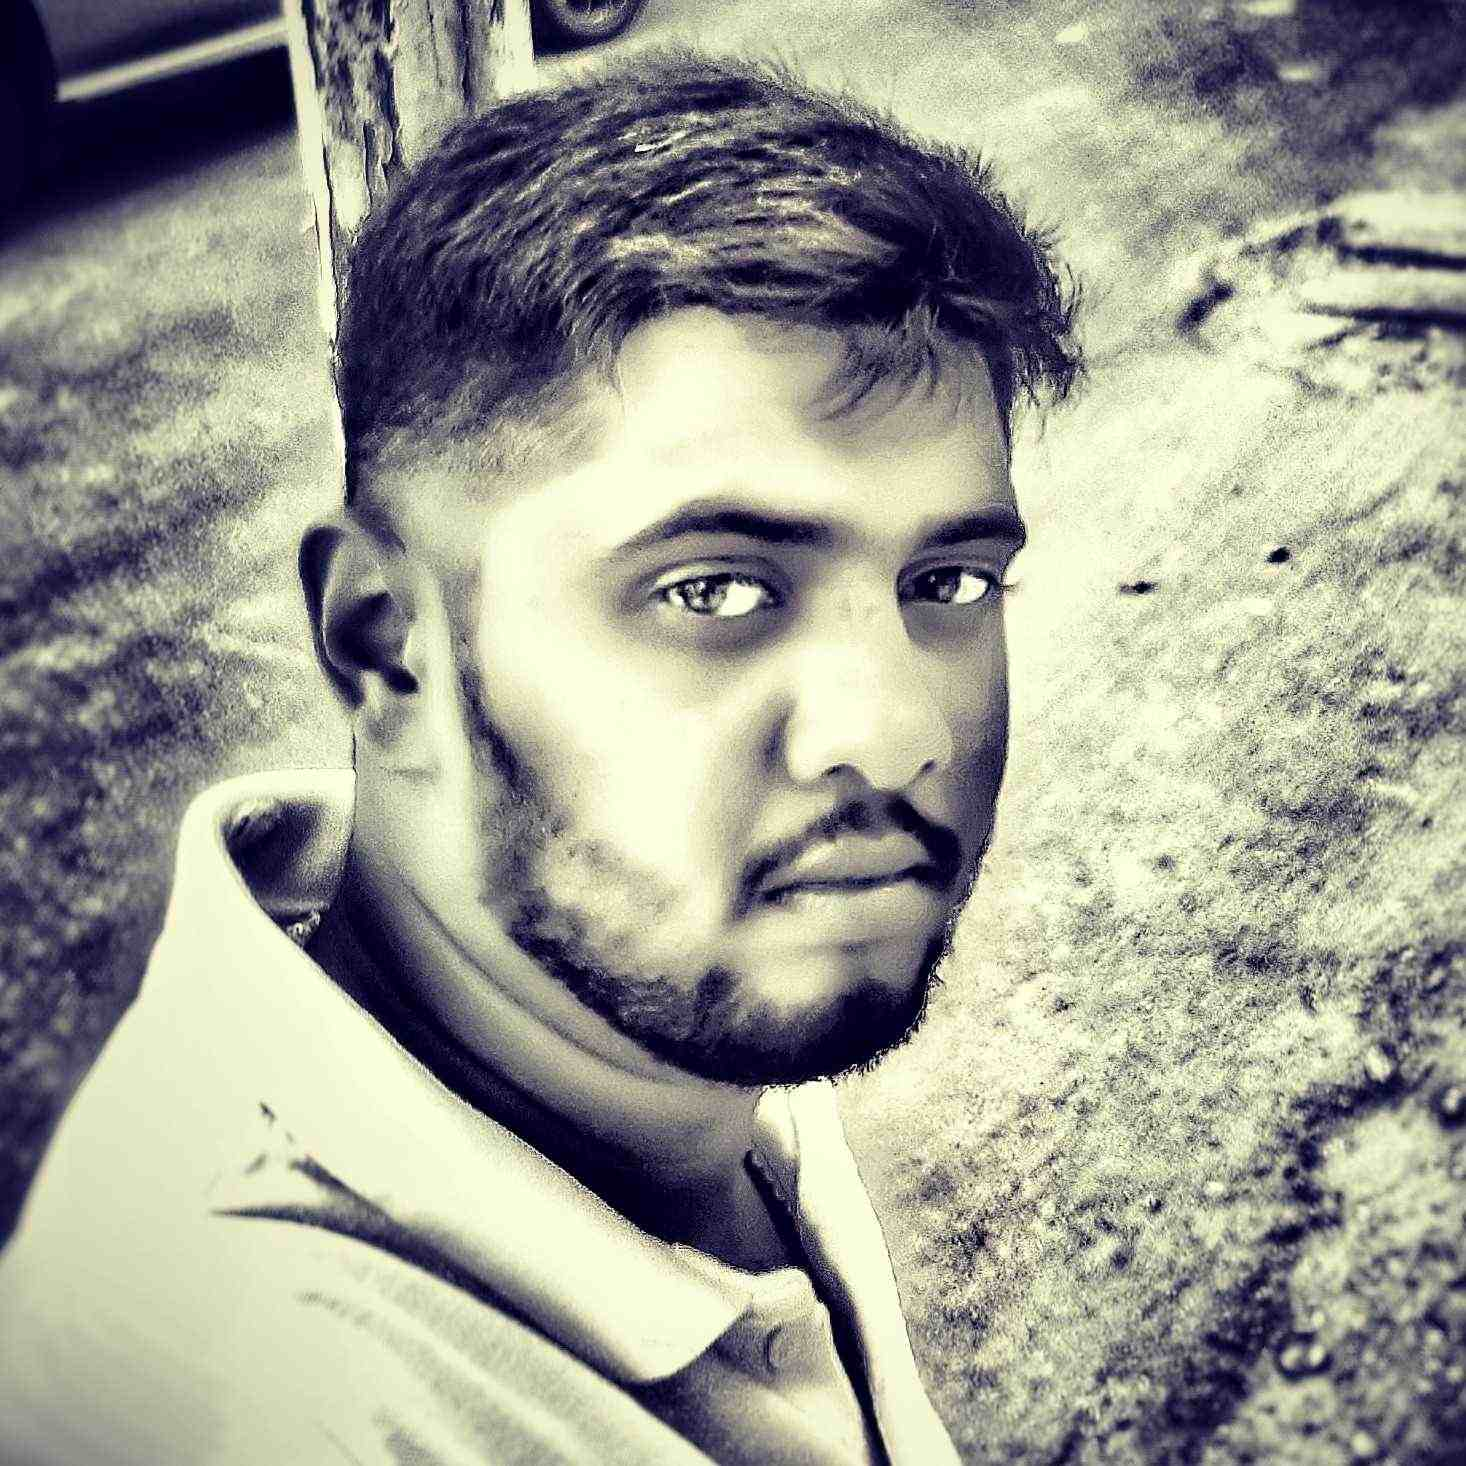 Duggaraj AP Shreyas